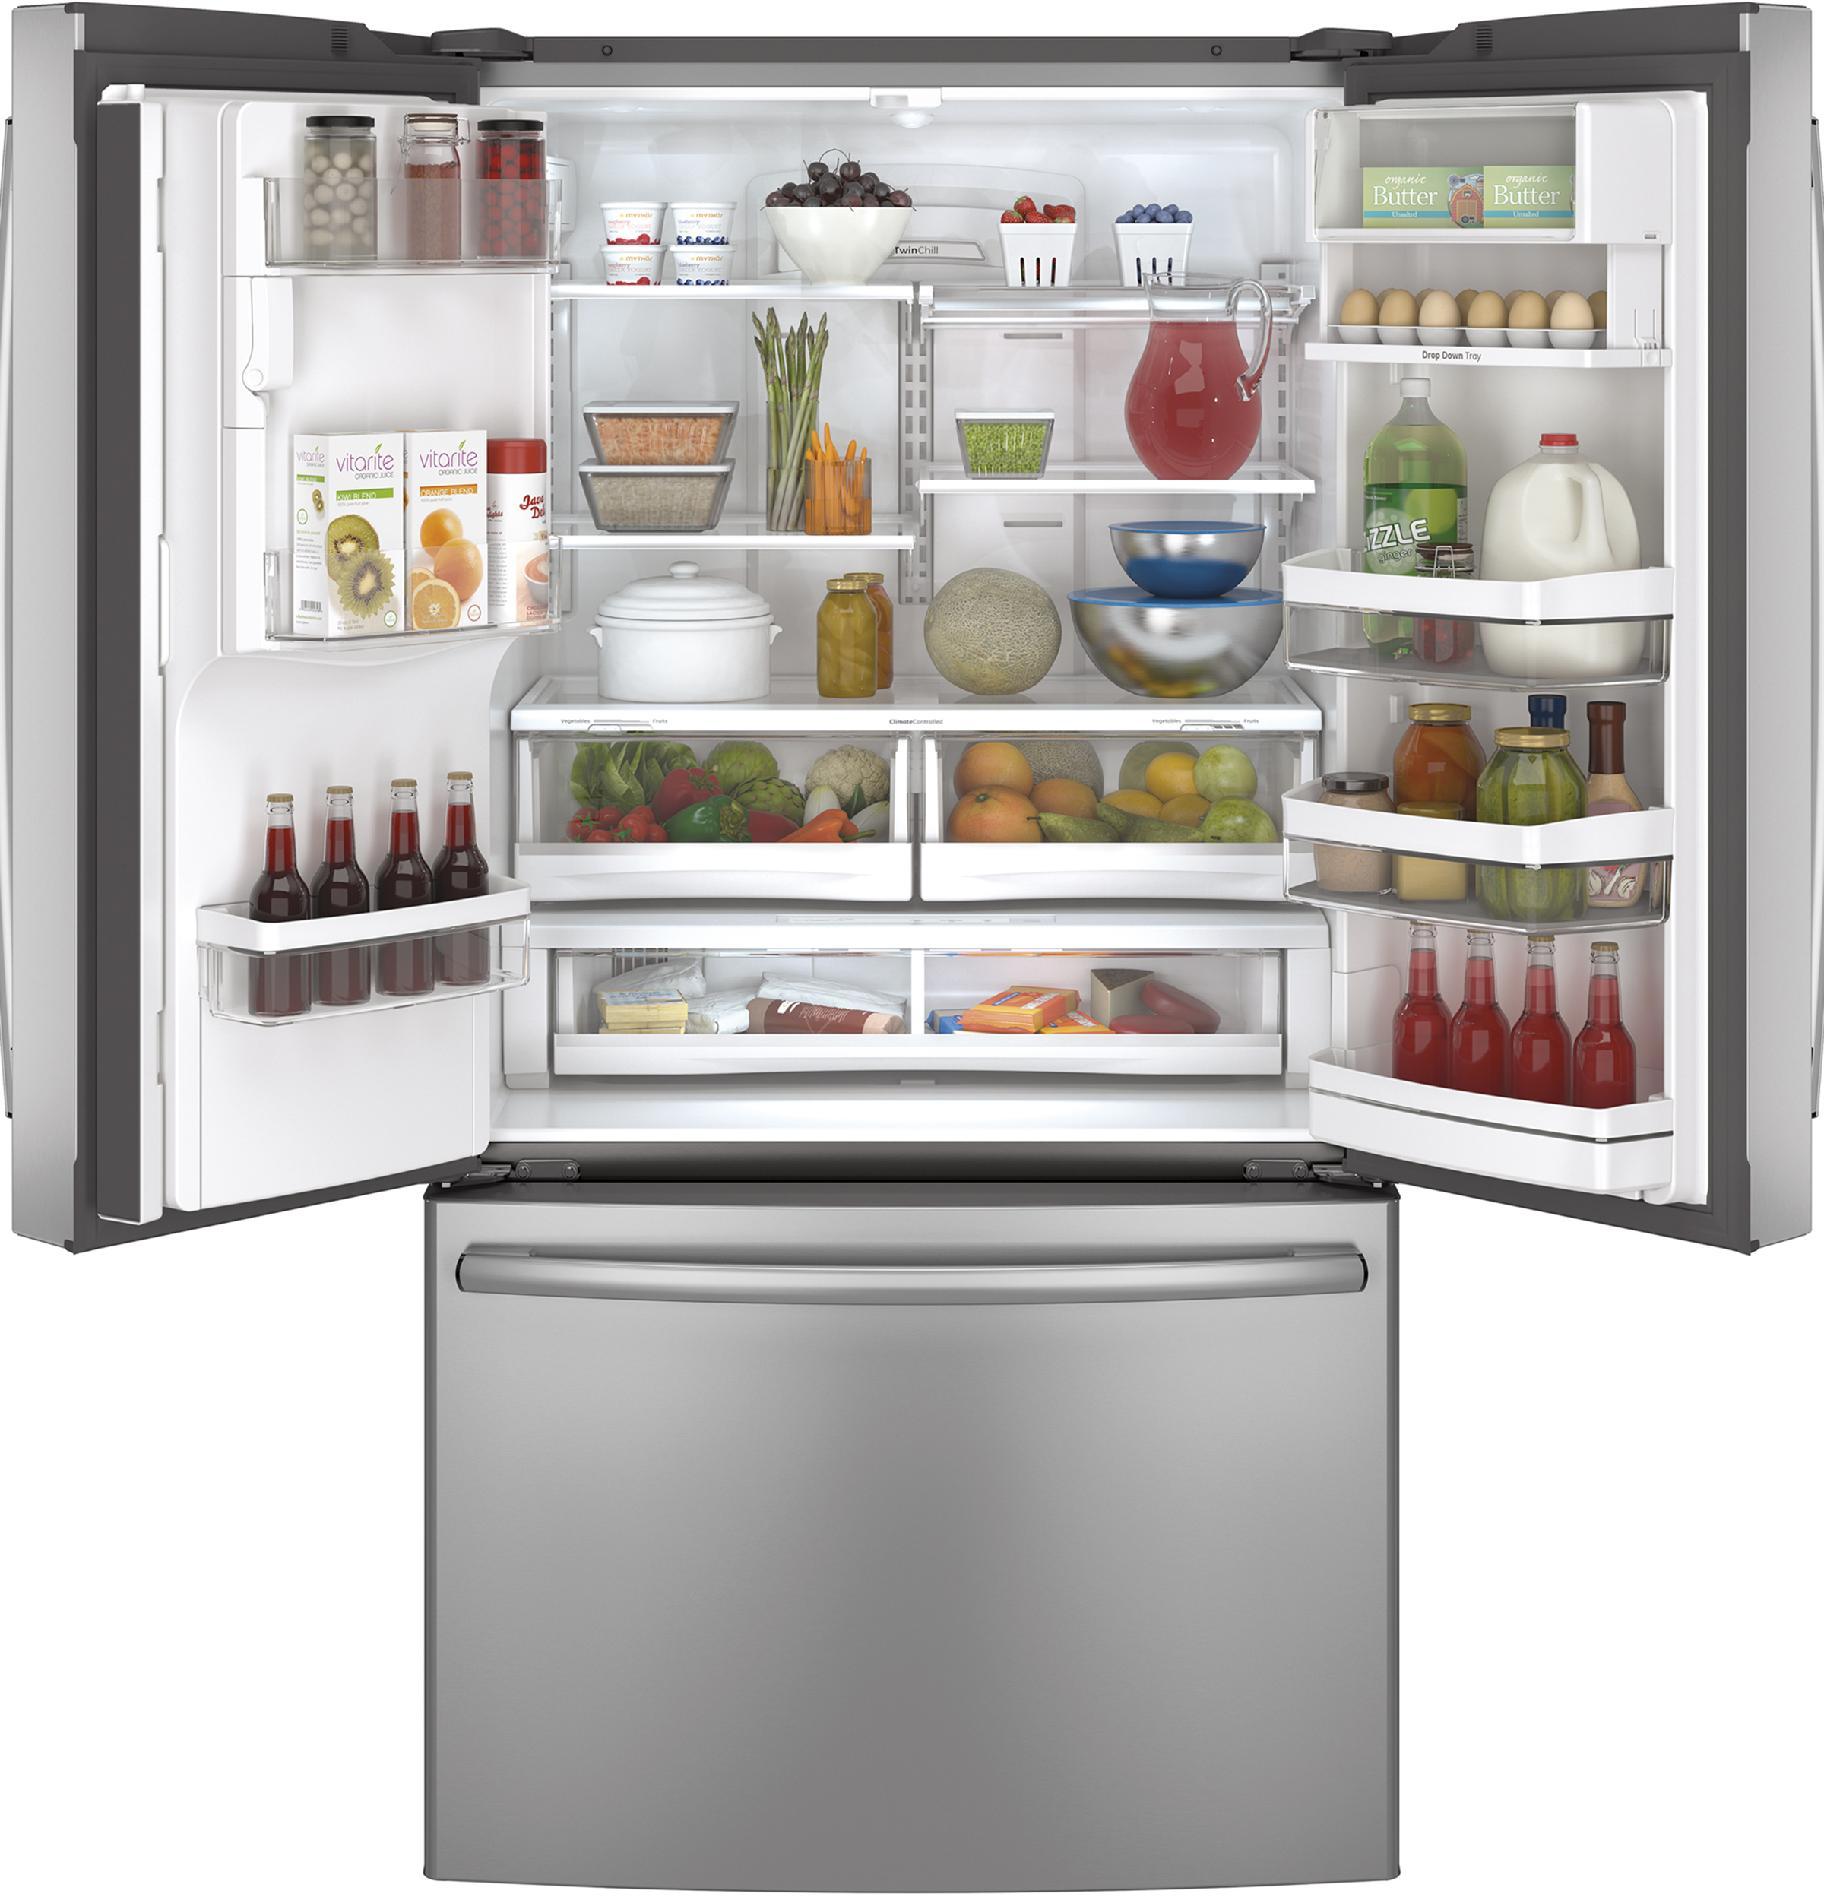 GE Profile PYE22PSHSS 22.1 cu. ft. Counter-Depth French-Door Ice & Water Refrigerator - Stainless Steel